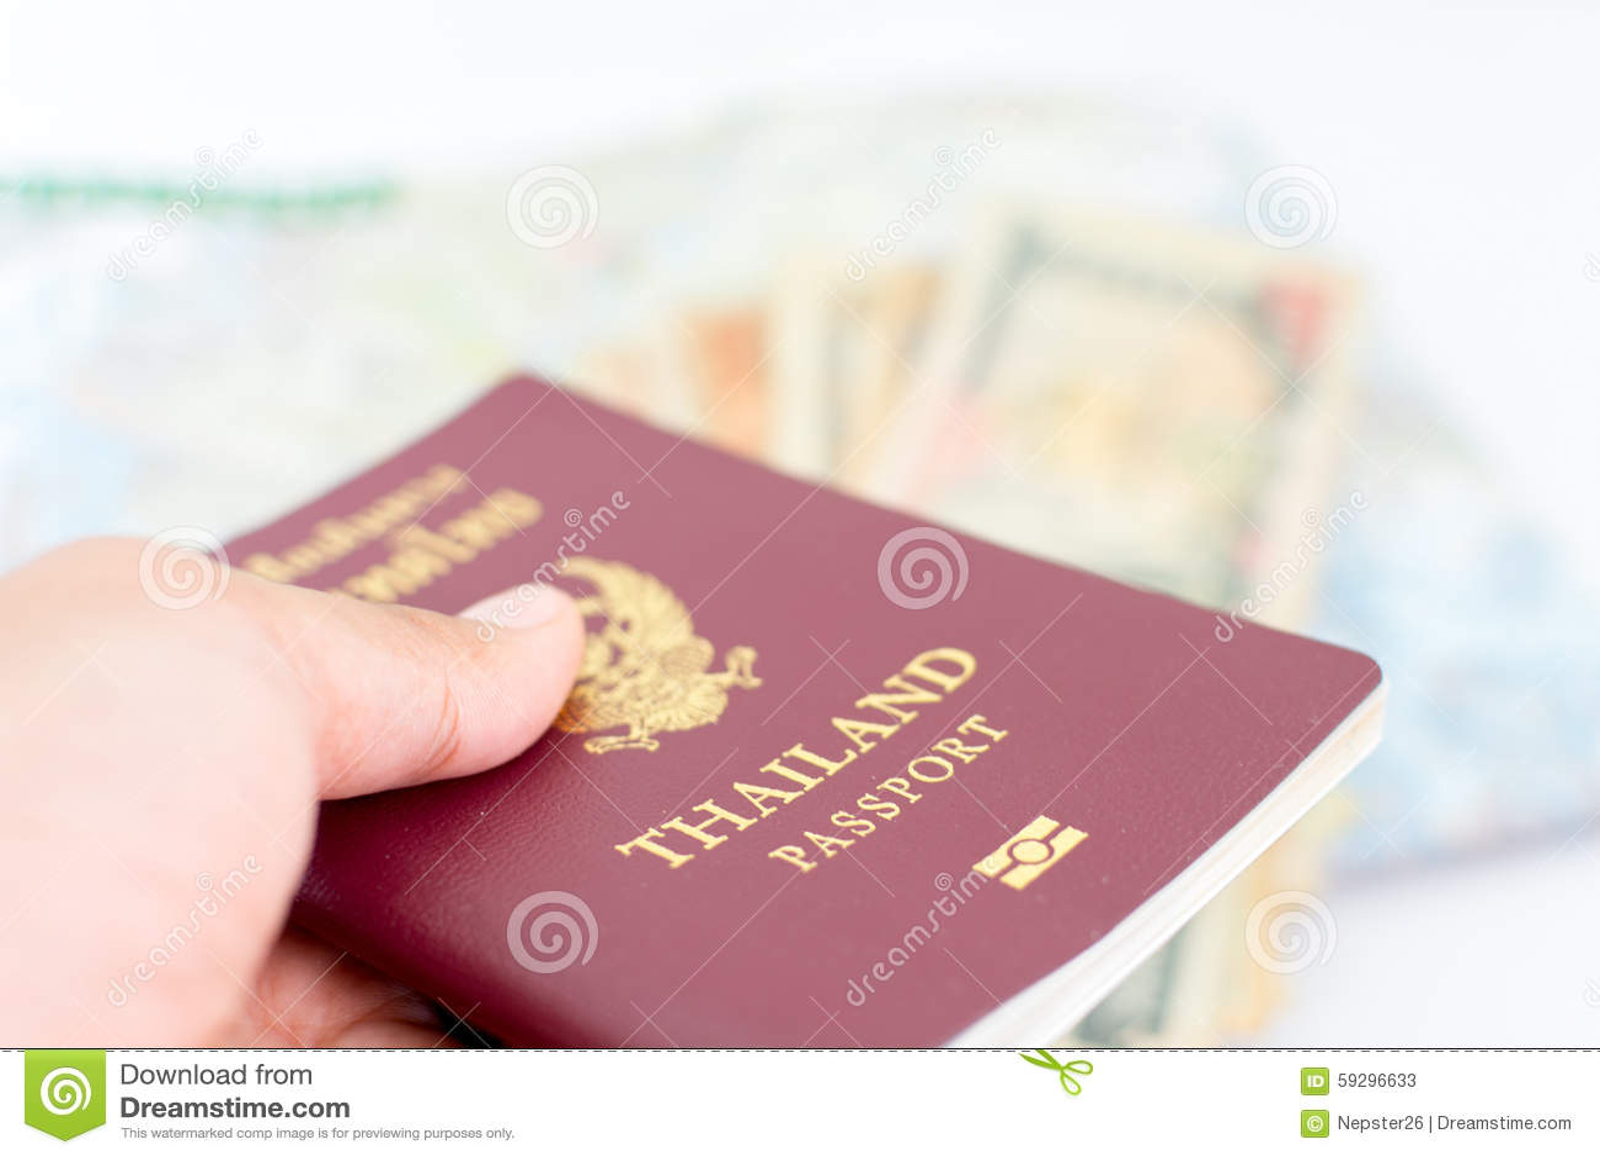 Thailand passport for tourism